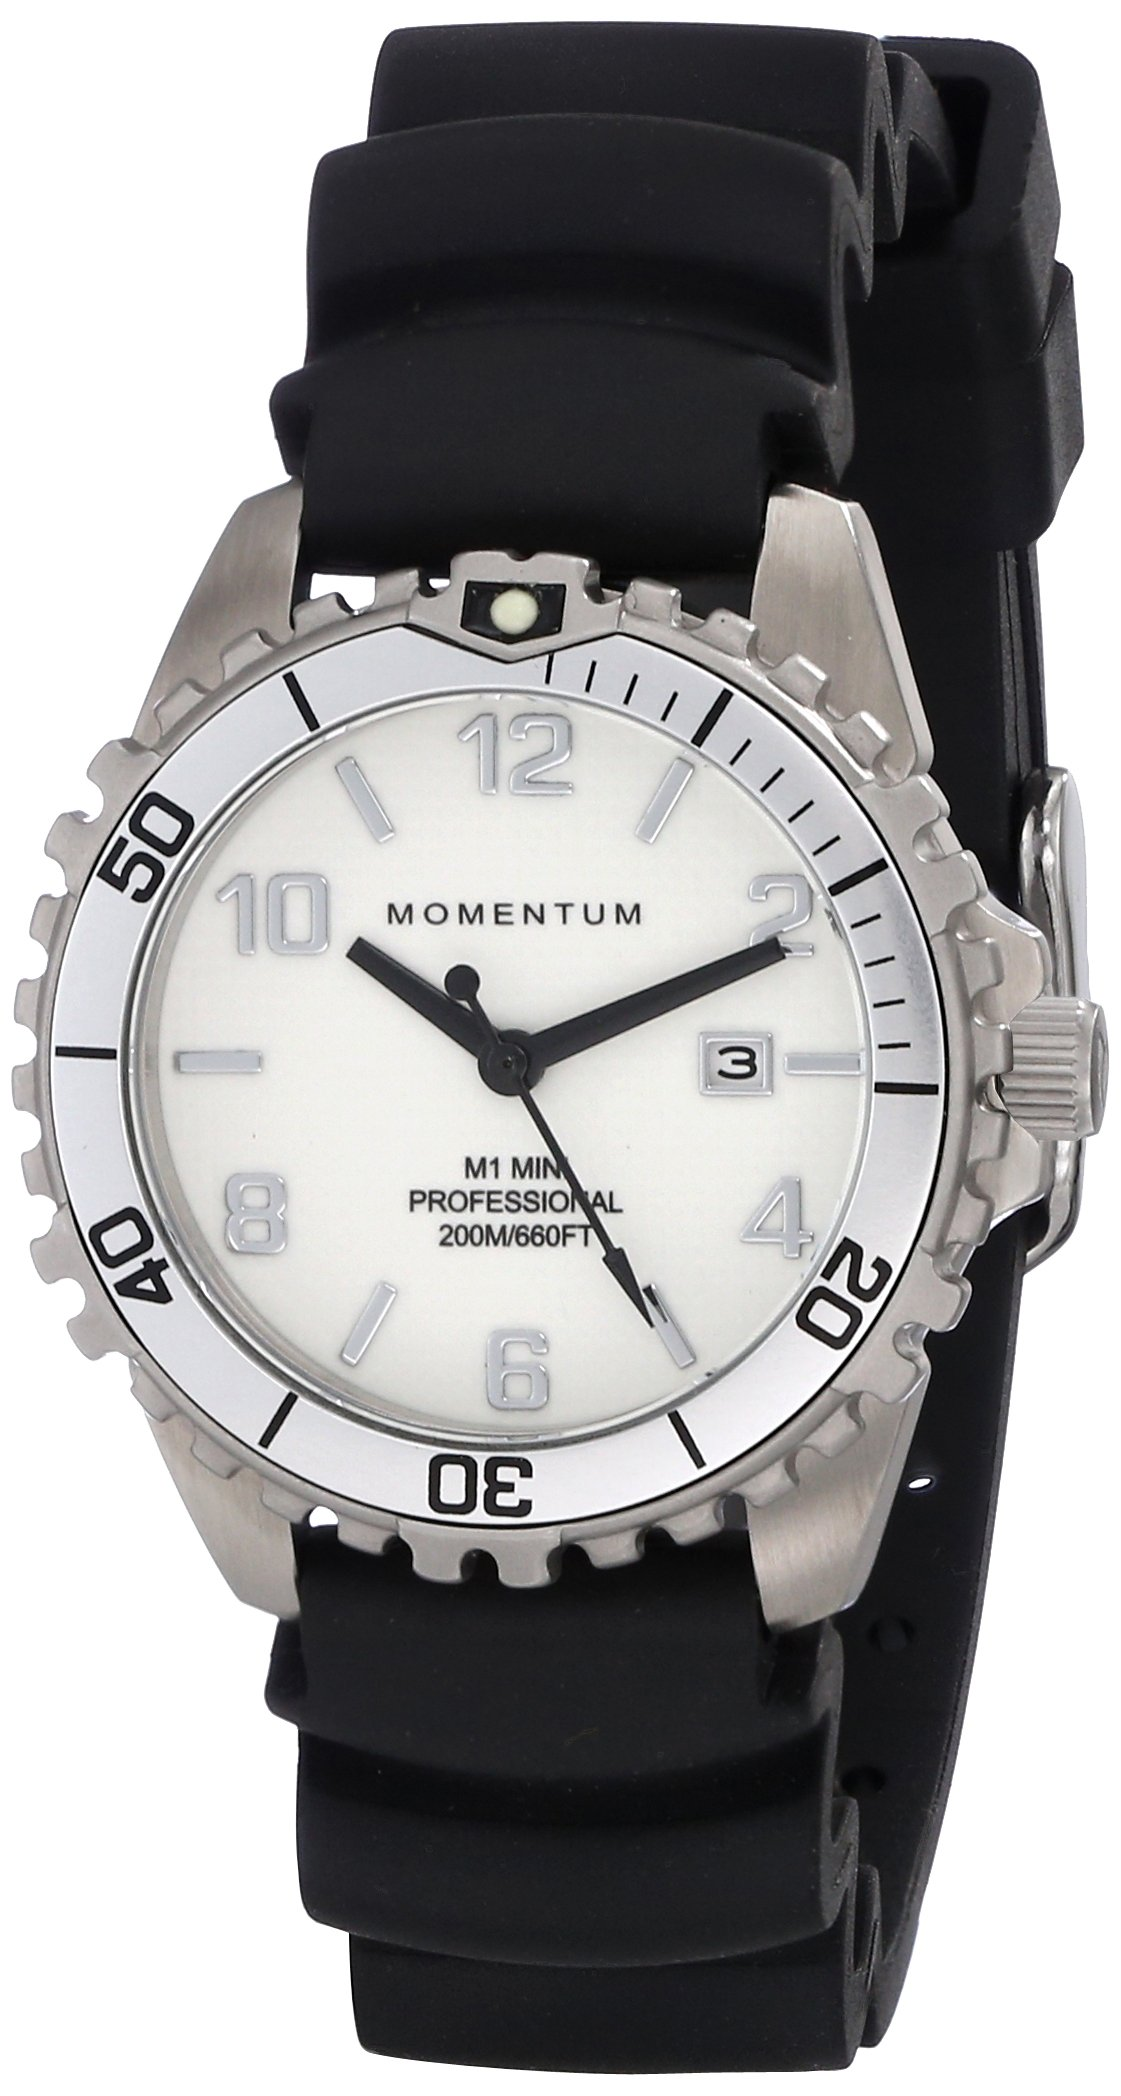 Momentum Women's 1M-DV07WS1B Mini Analog Display Quartz Black Watch